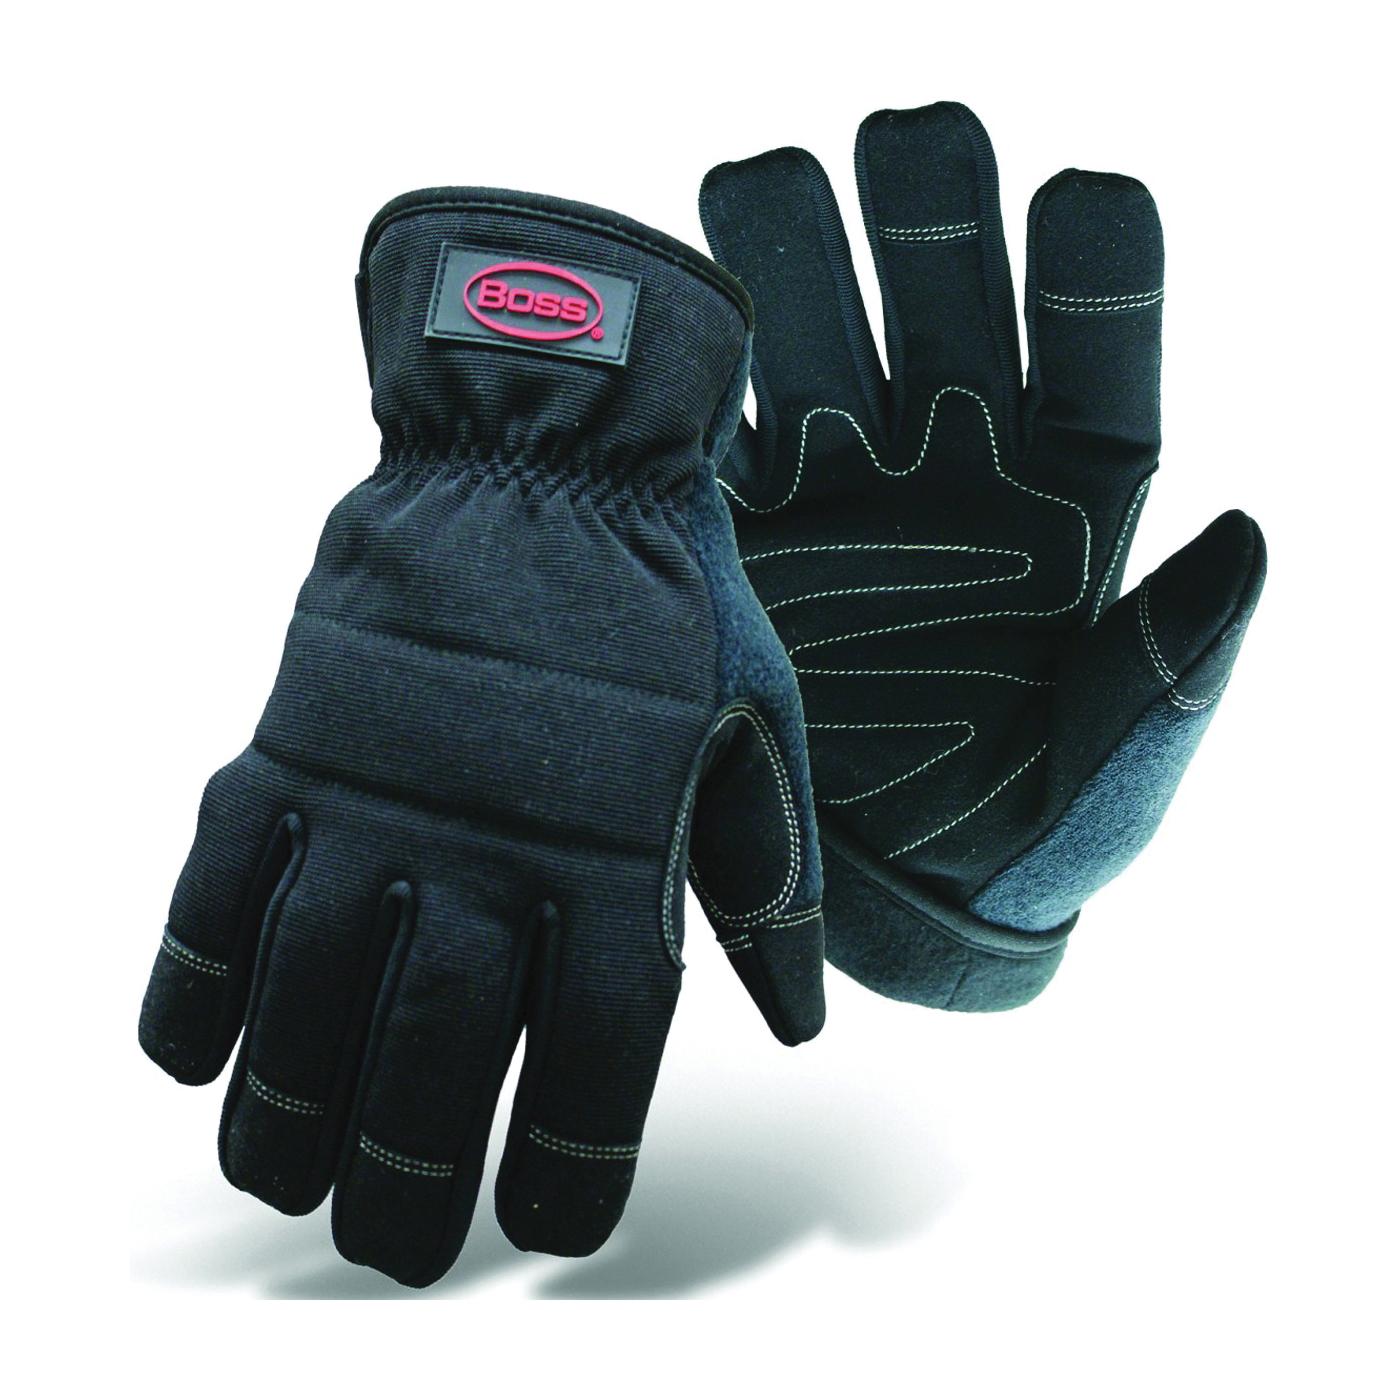 Picture of BOSS 5207L Multi-Purpose Utility Gloves, L, Wing Thumb, Fleece, Black